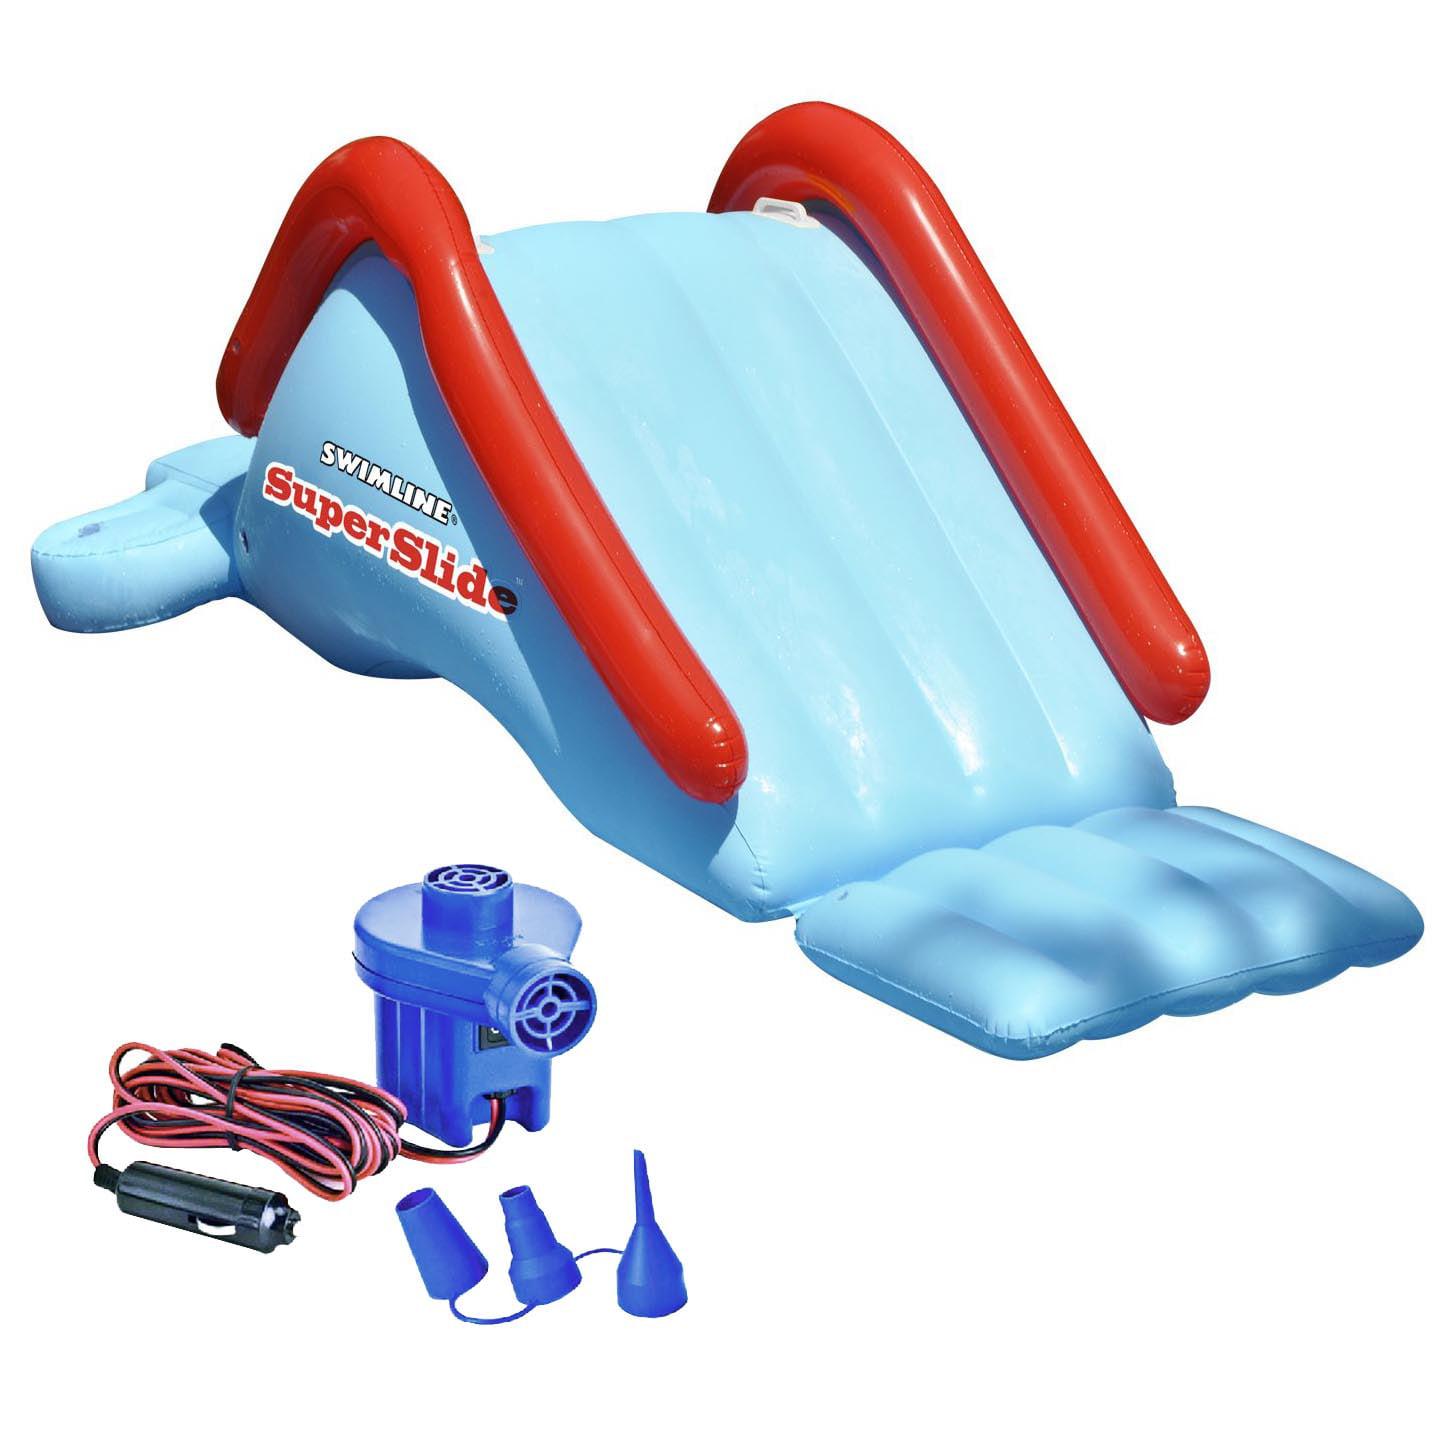 Swimline 90809 Super Water Slide Swimming Pool Inflatable Kids w/ 12V Air Pump